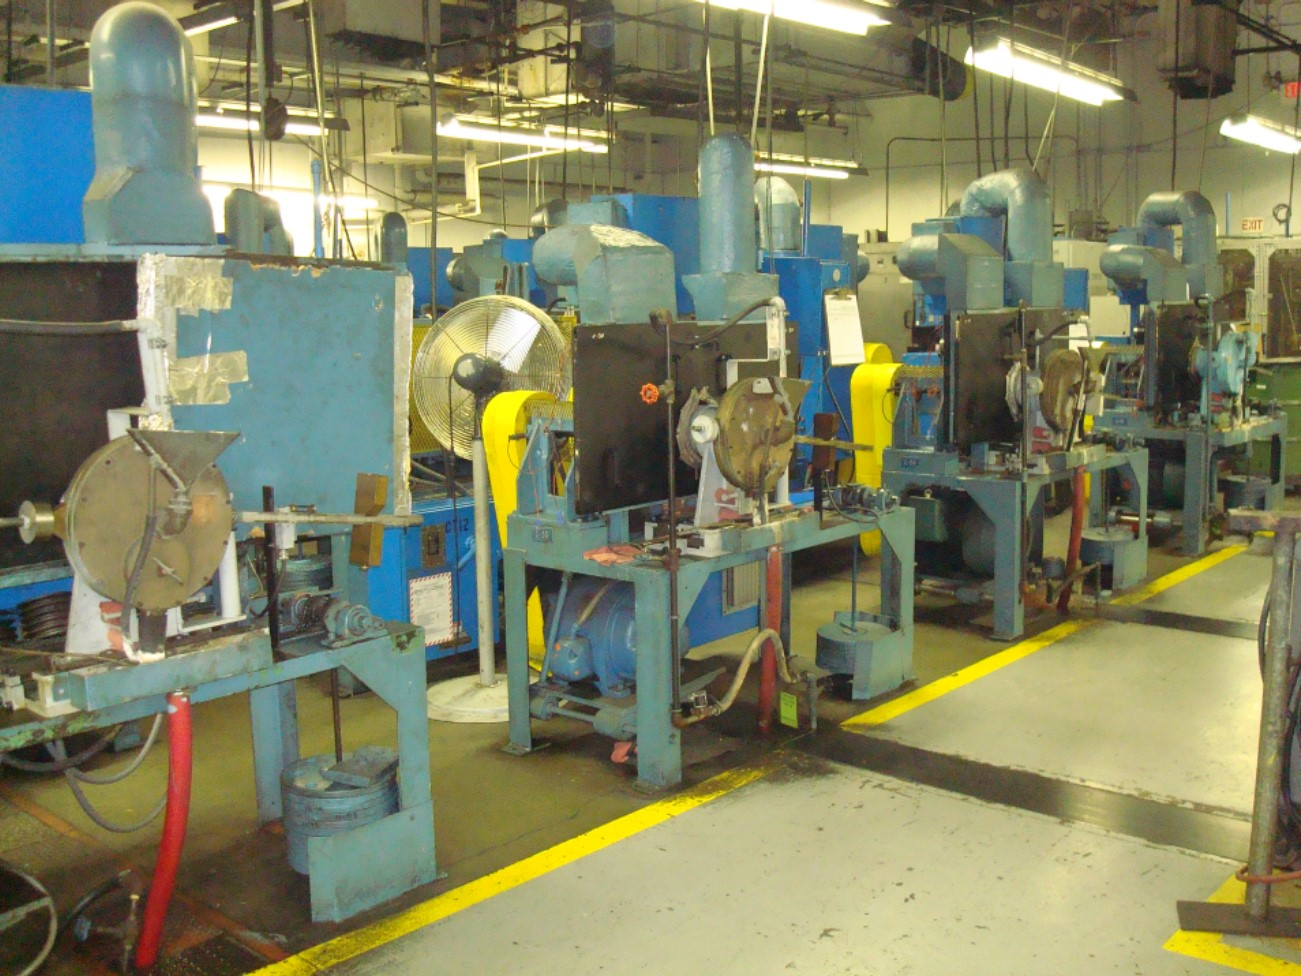 Dayco Belt Testing Facility